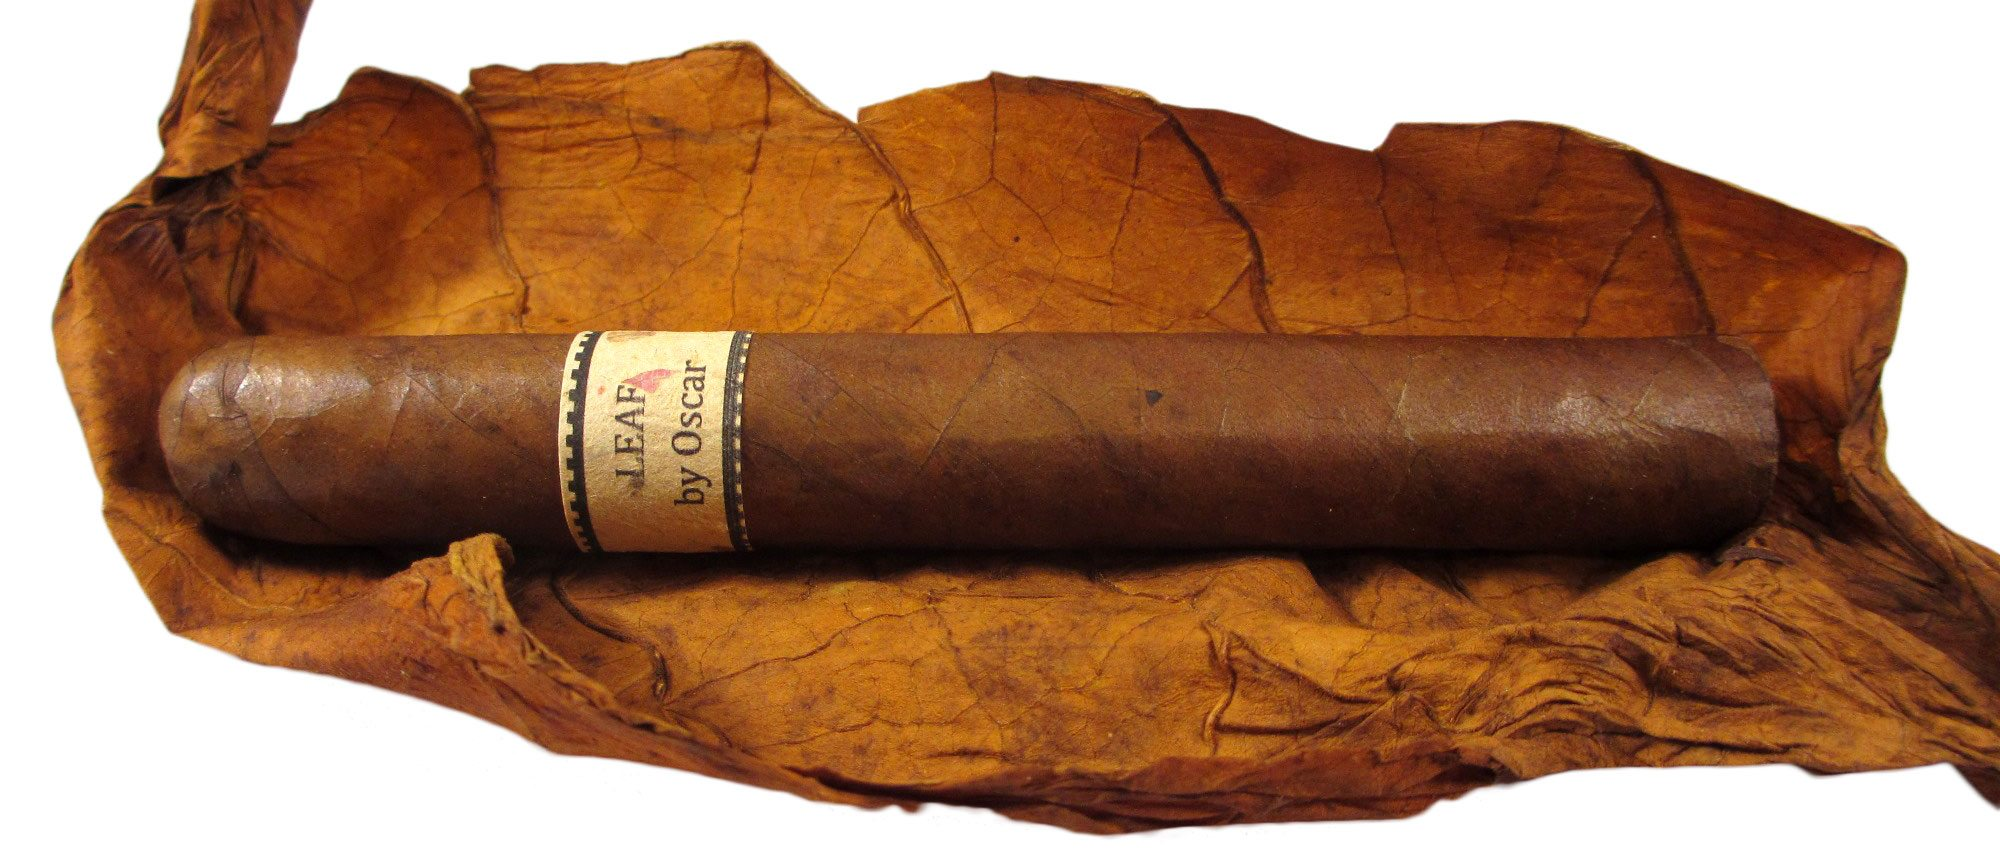 Blind Cigar Review: Puros de Ballard | The Leaf by Oscar Corojo Toro